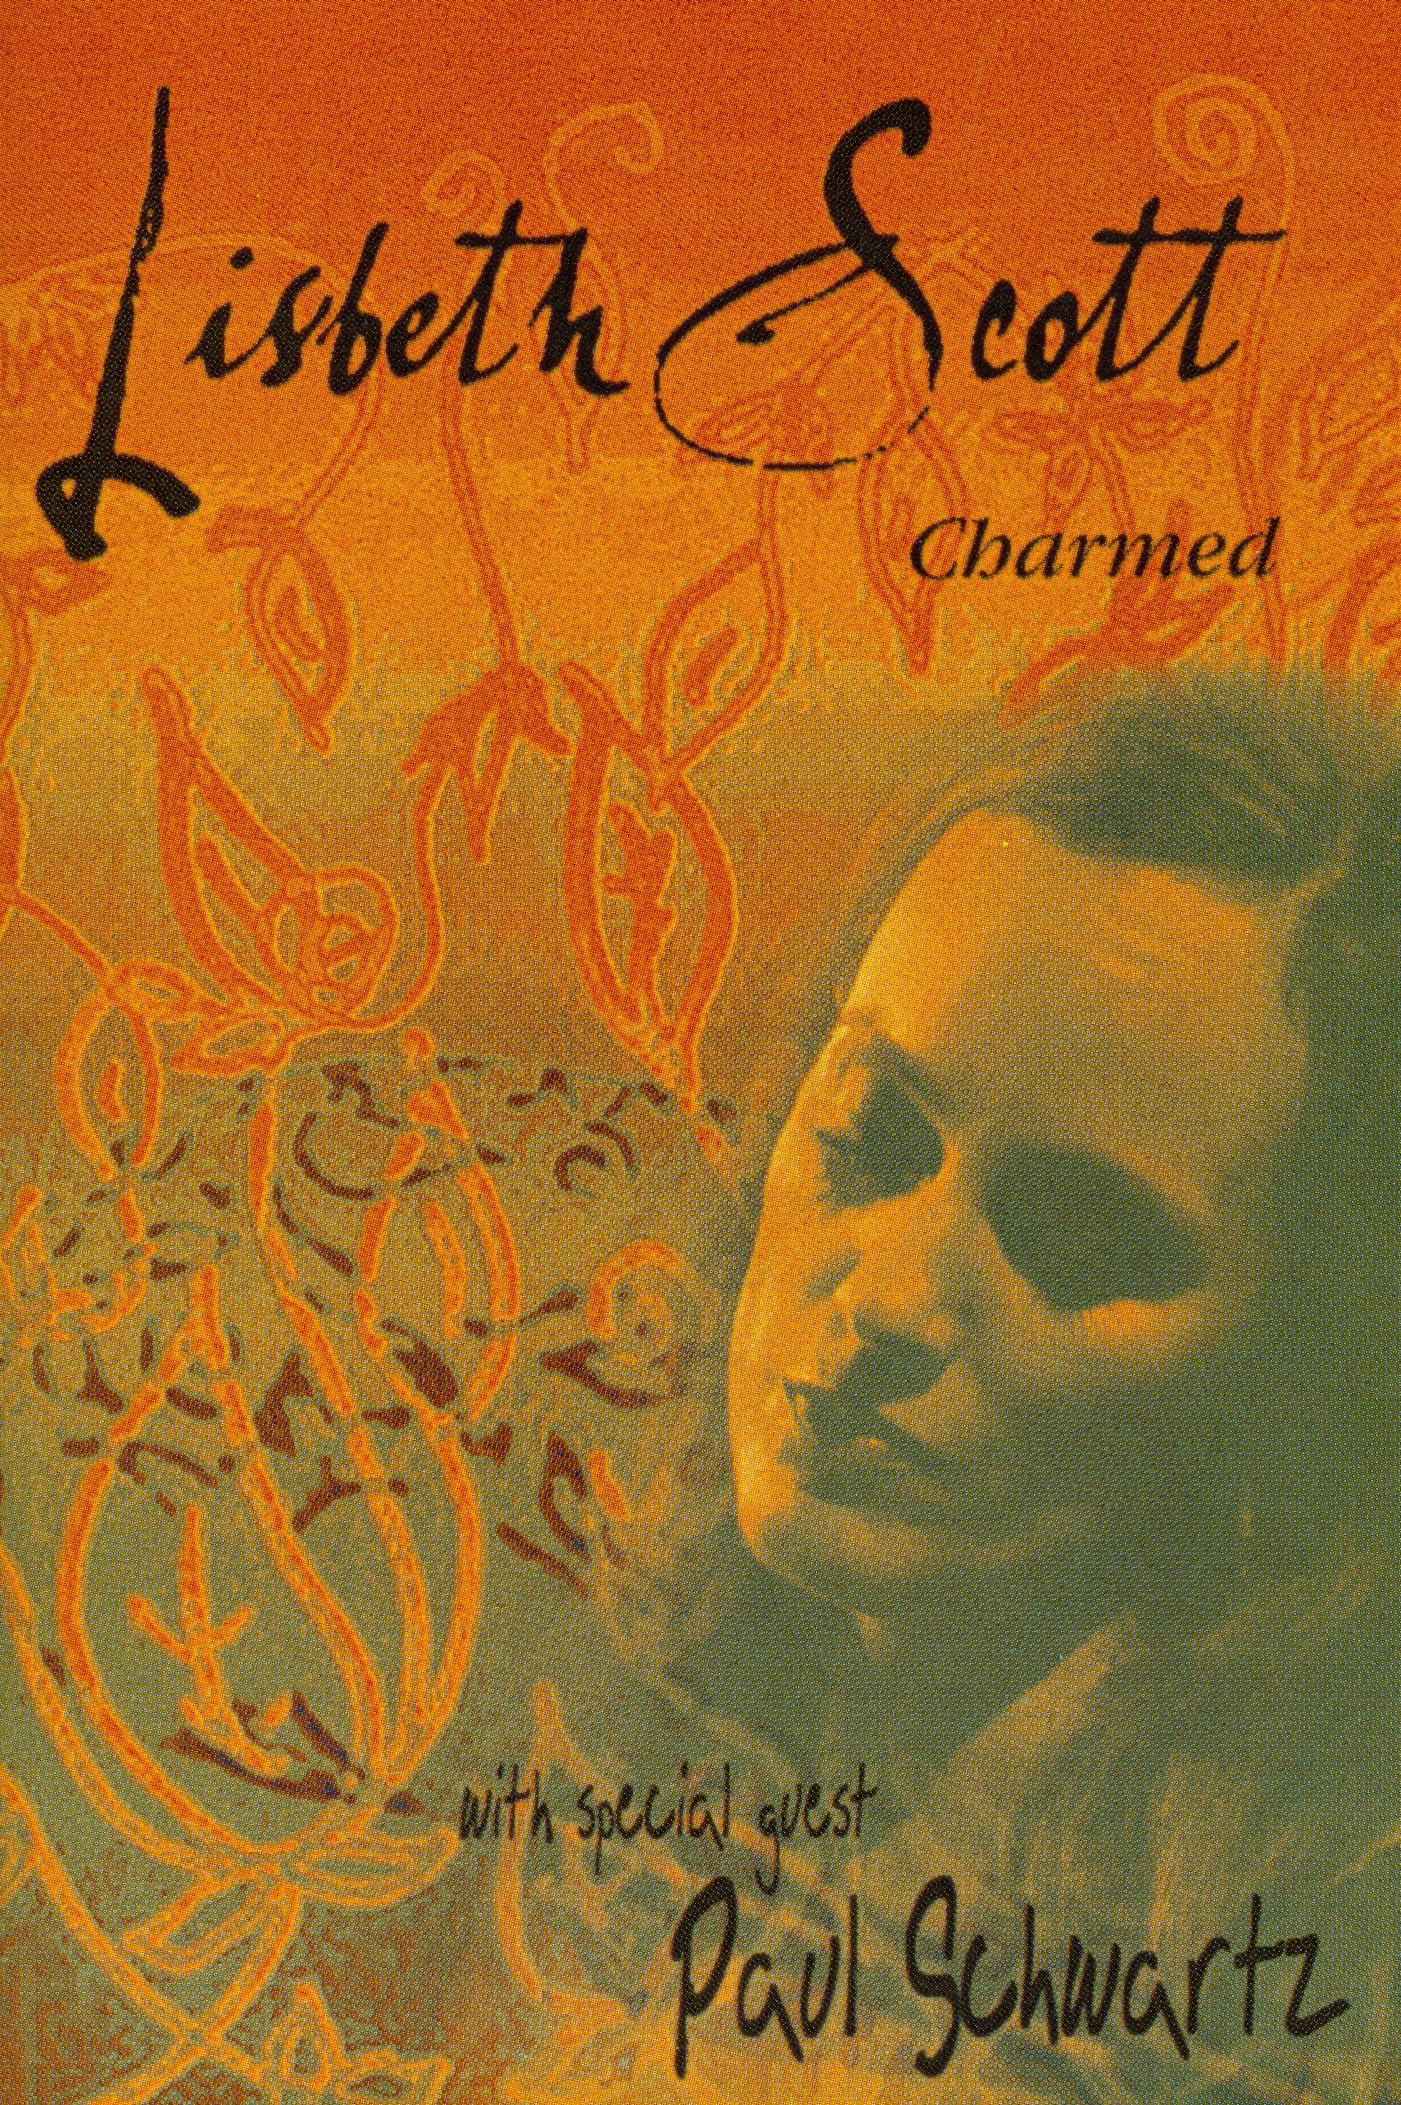 Lisbeth Scott with Special Guest Paul Schwartz: Charmed